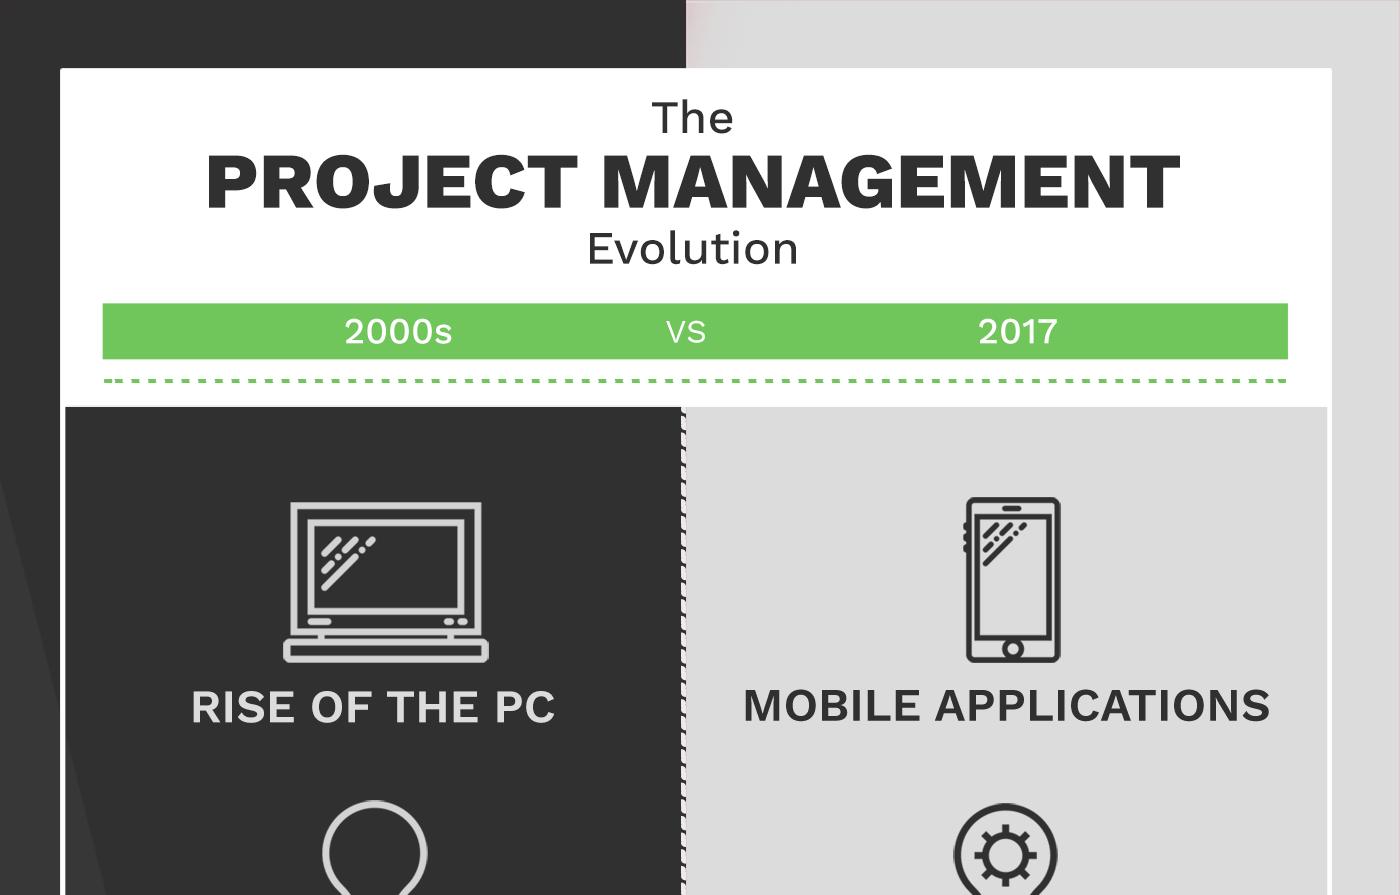 Scoro Infographic - Project Management